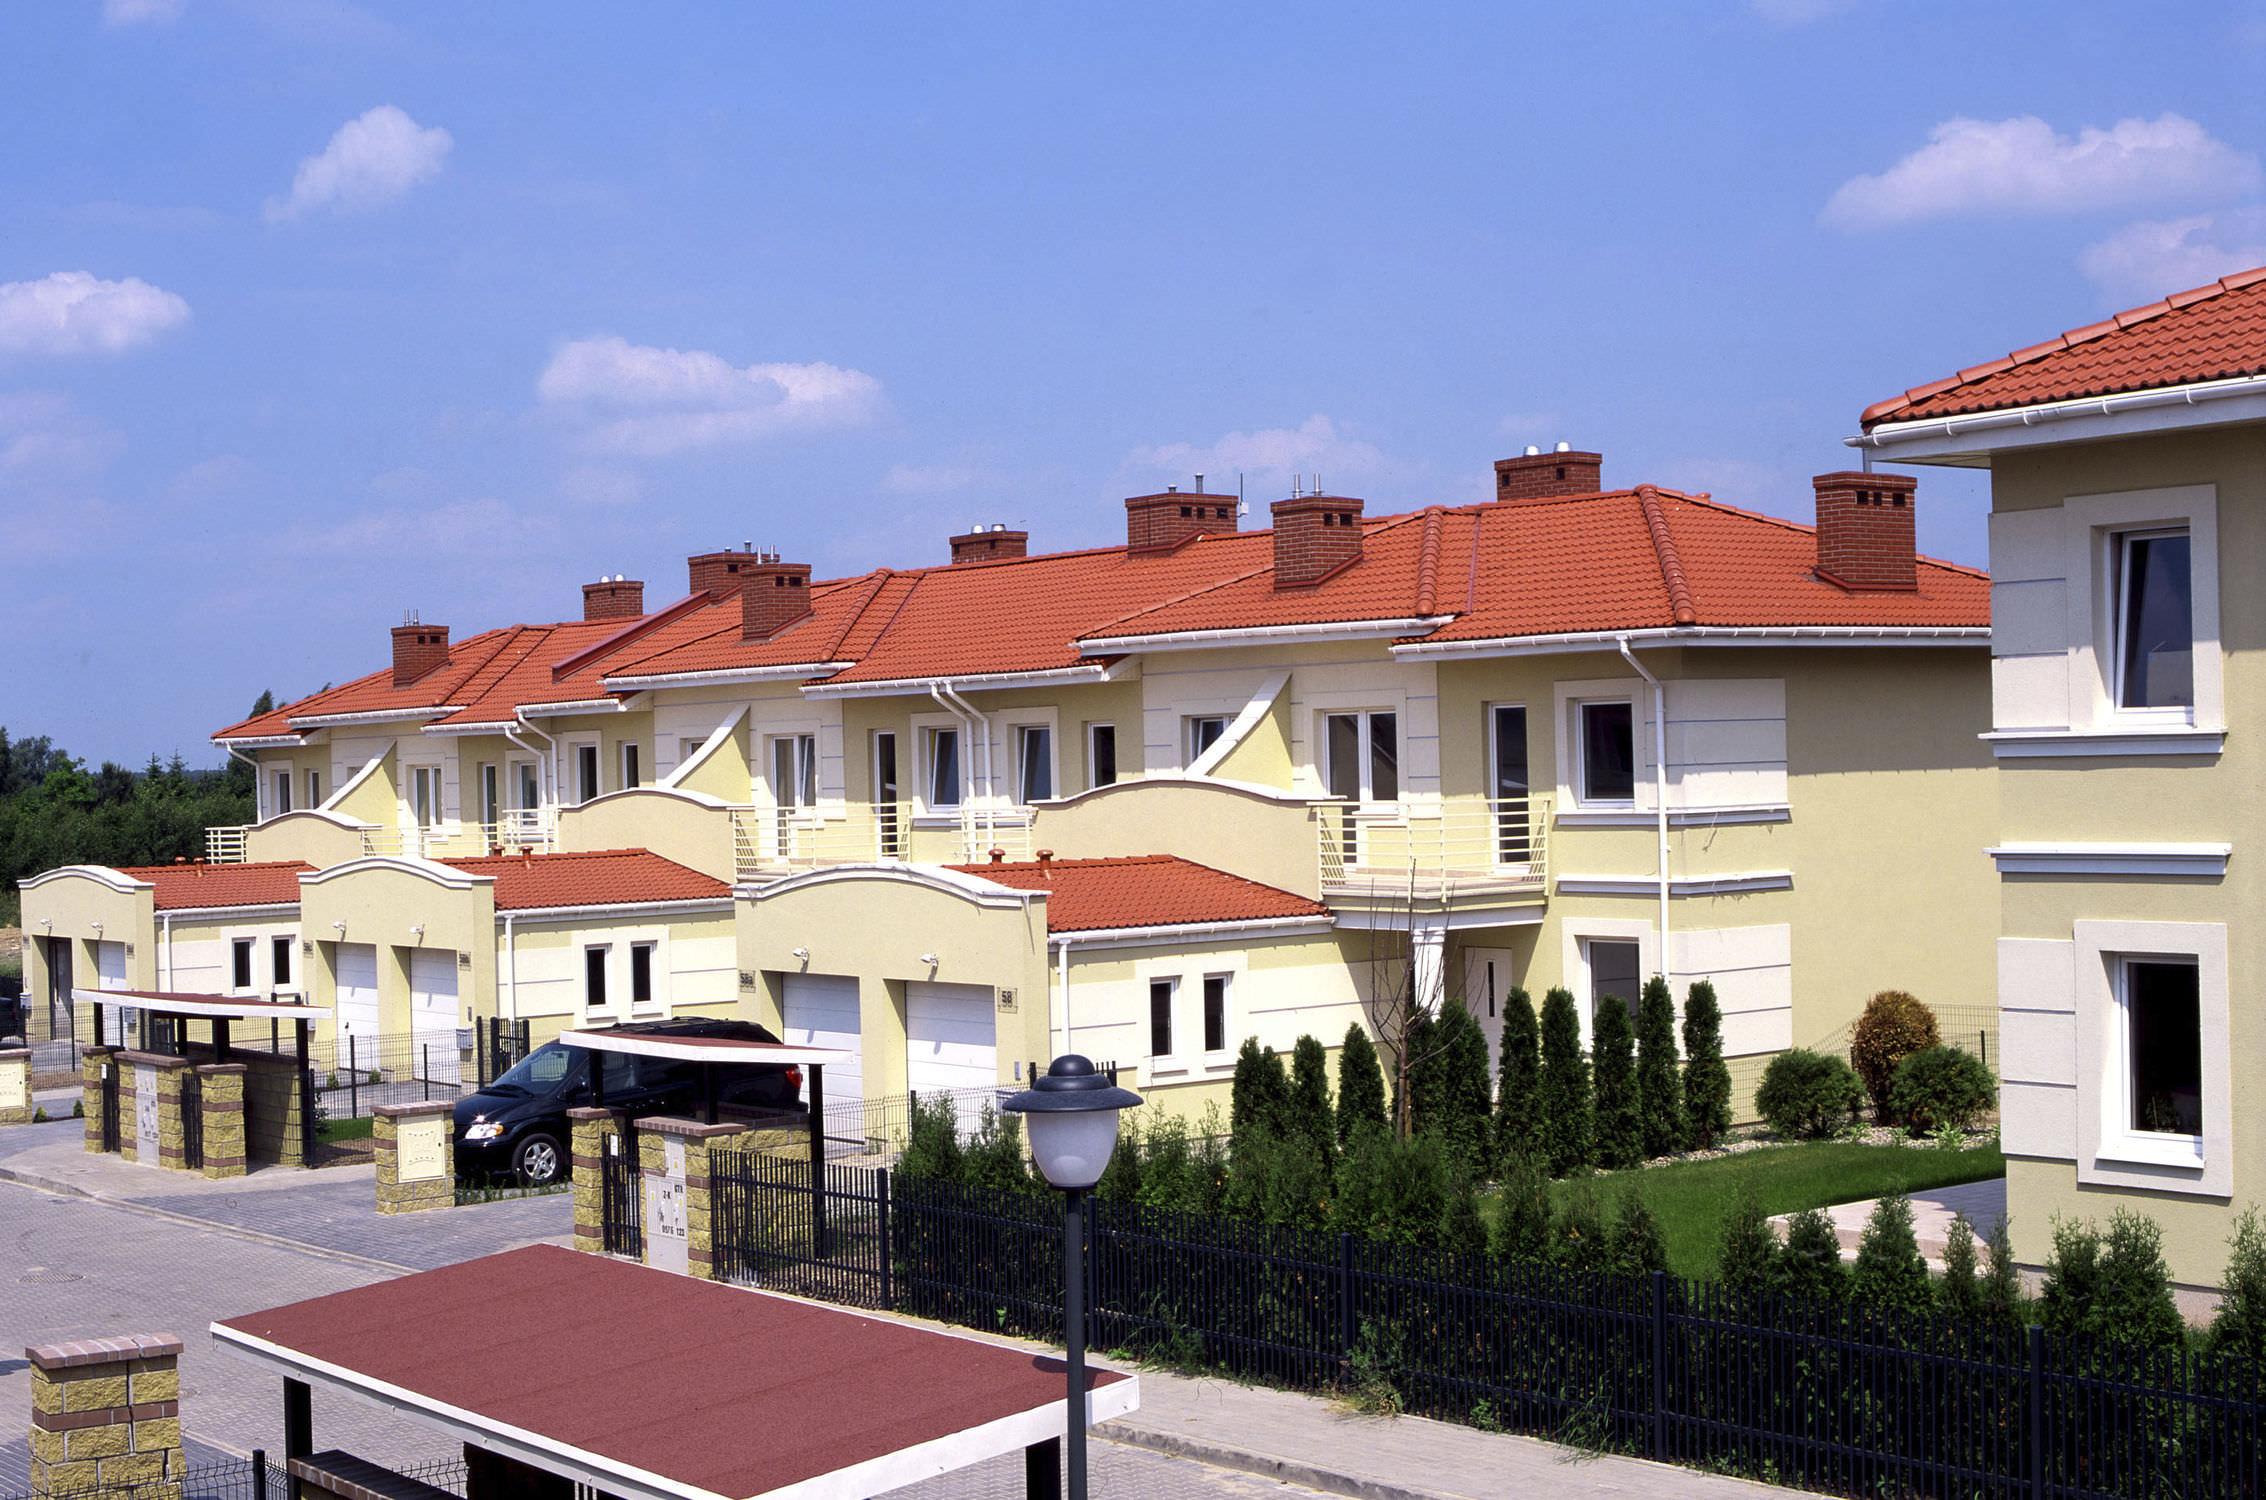 French Roof Tile Double Roman Monier Braas Concrete